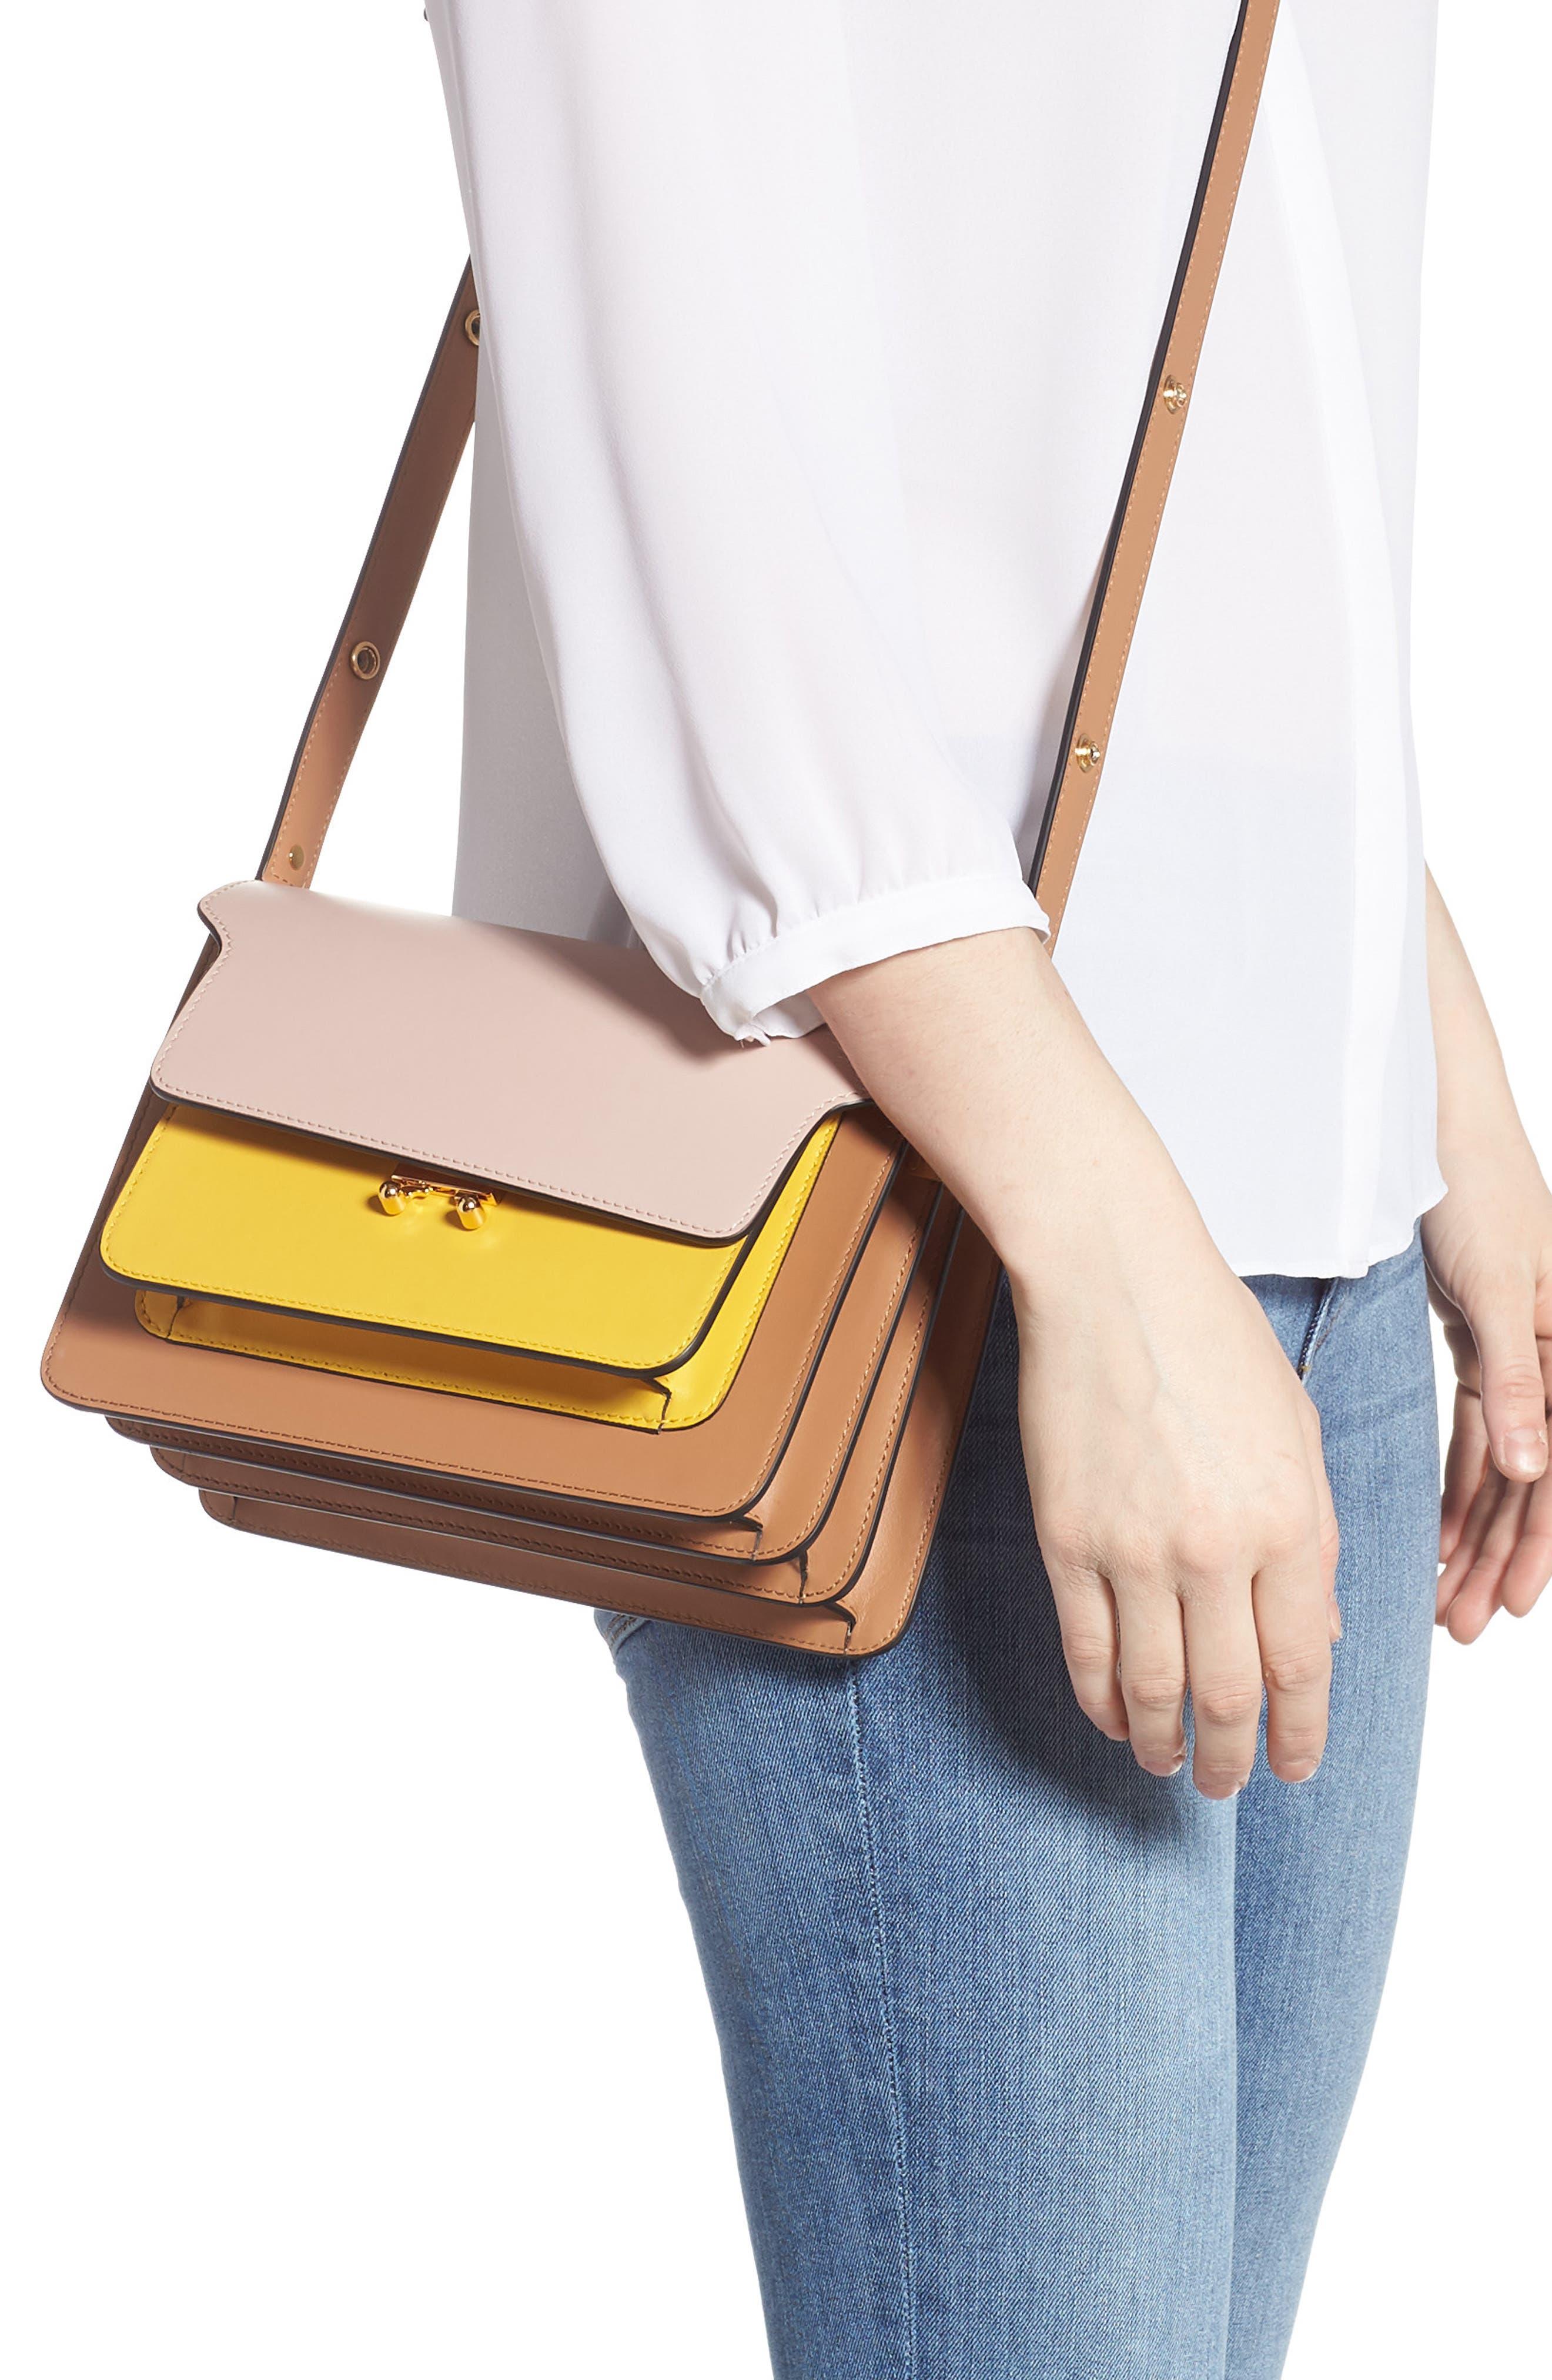 MARNI,                             Trunk Colorblock Leather Shoulder Bag,                             Alternate thumbnail 2, color,                             QUARTZ/ SUNO/ POMPEII